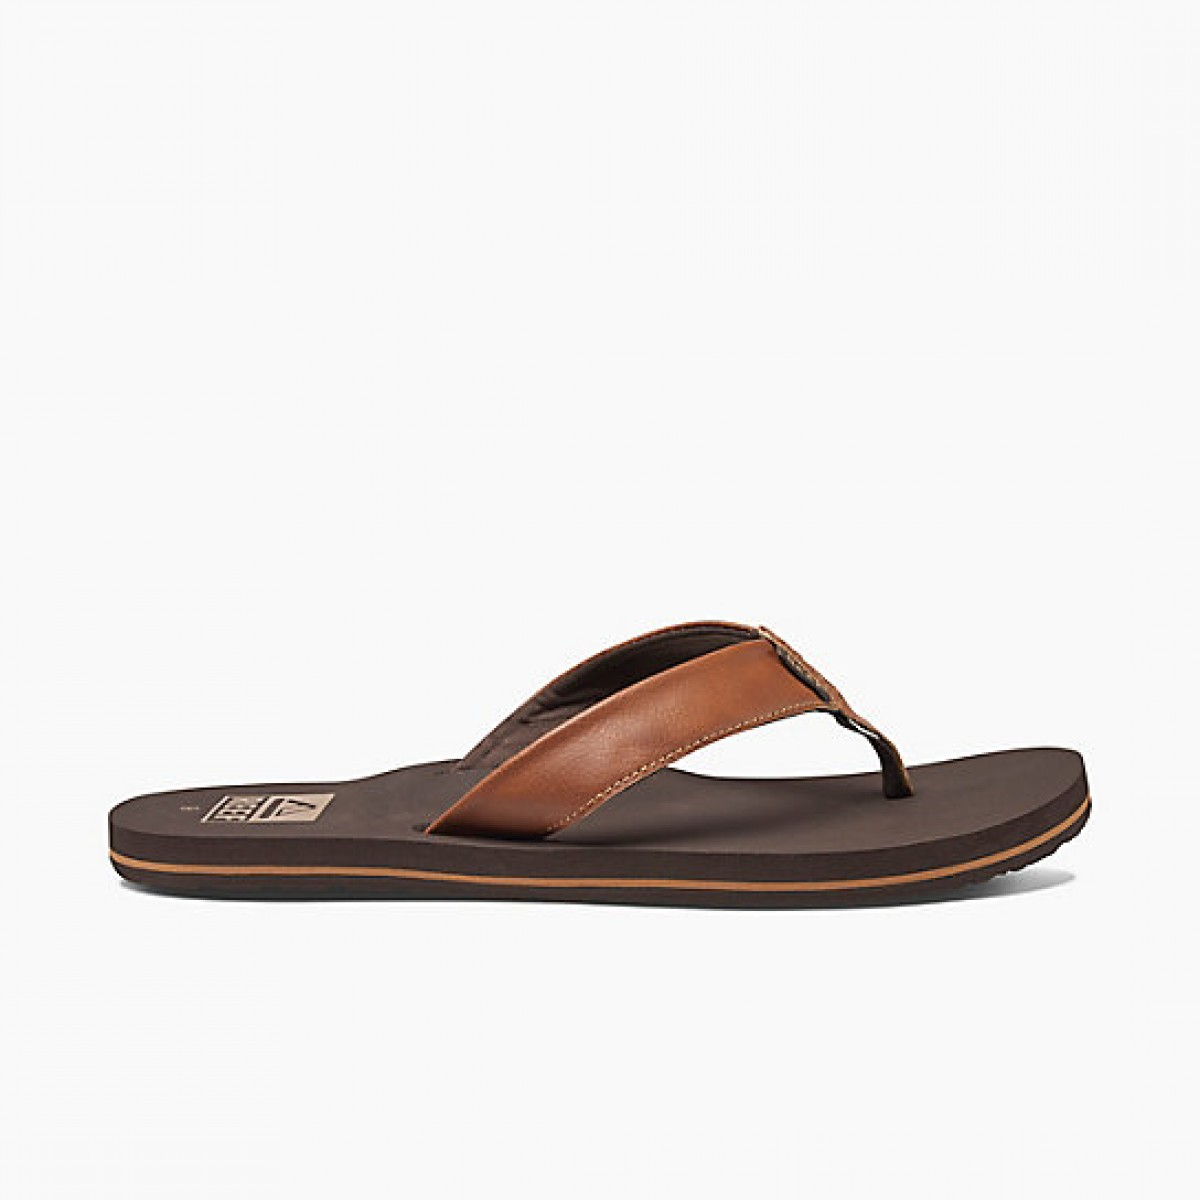 07d48735 Reef Twinpin Classic Flip Flops (Brown)